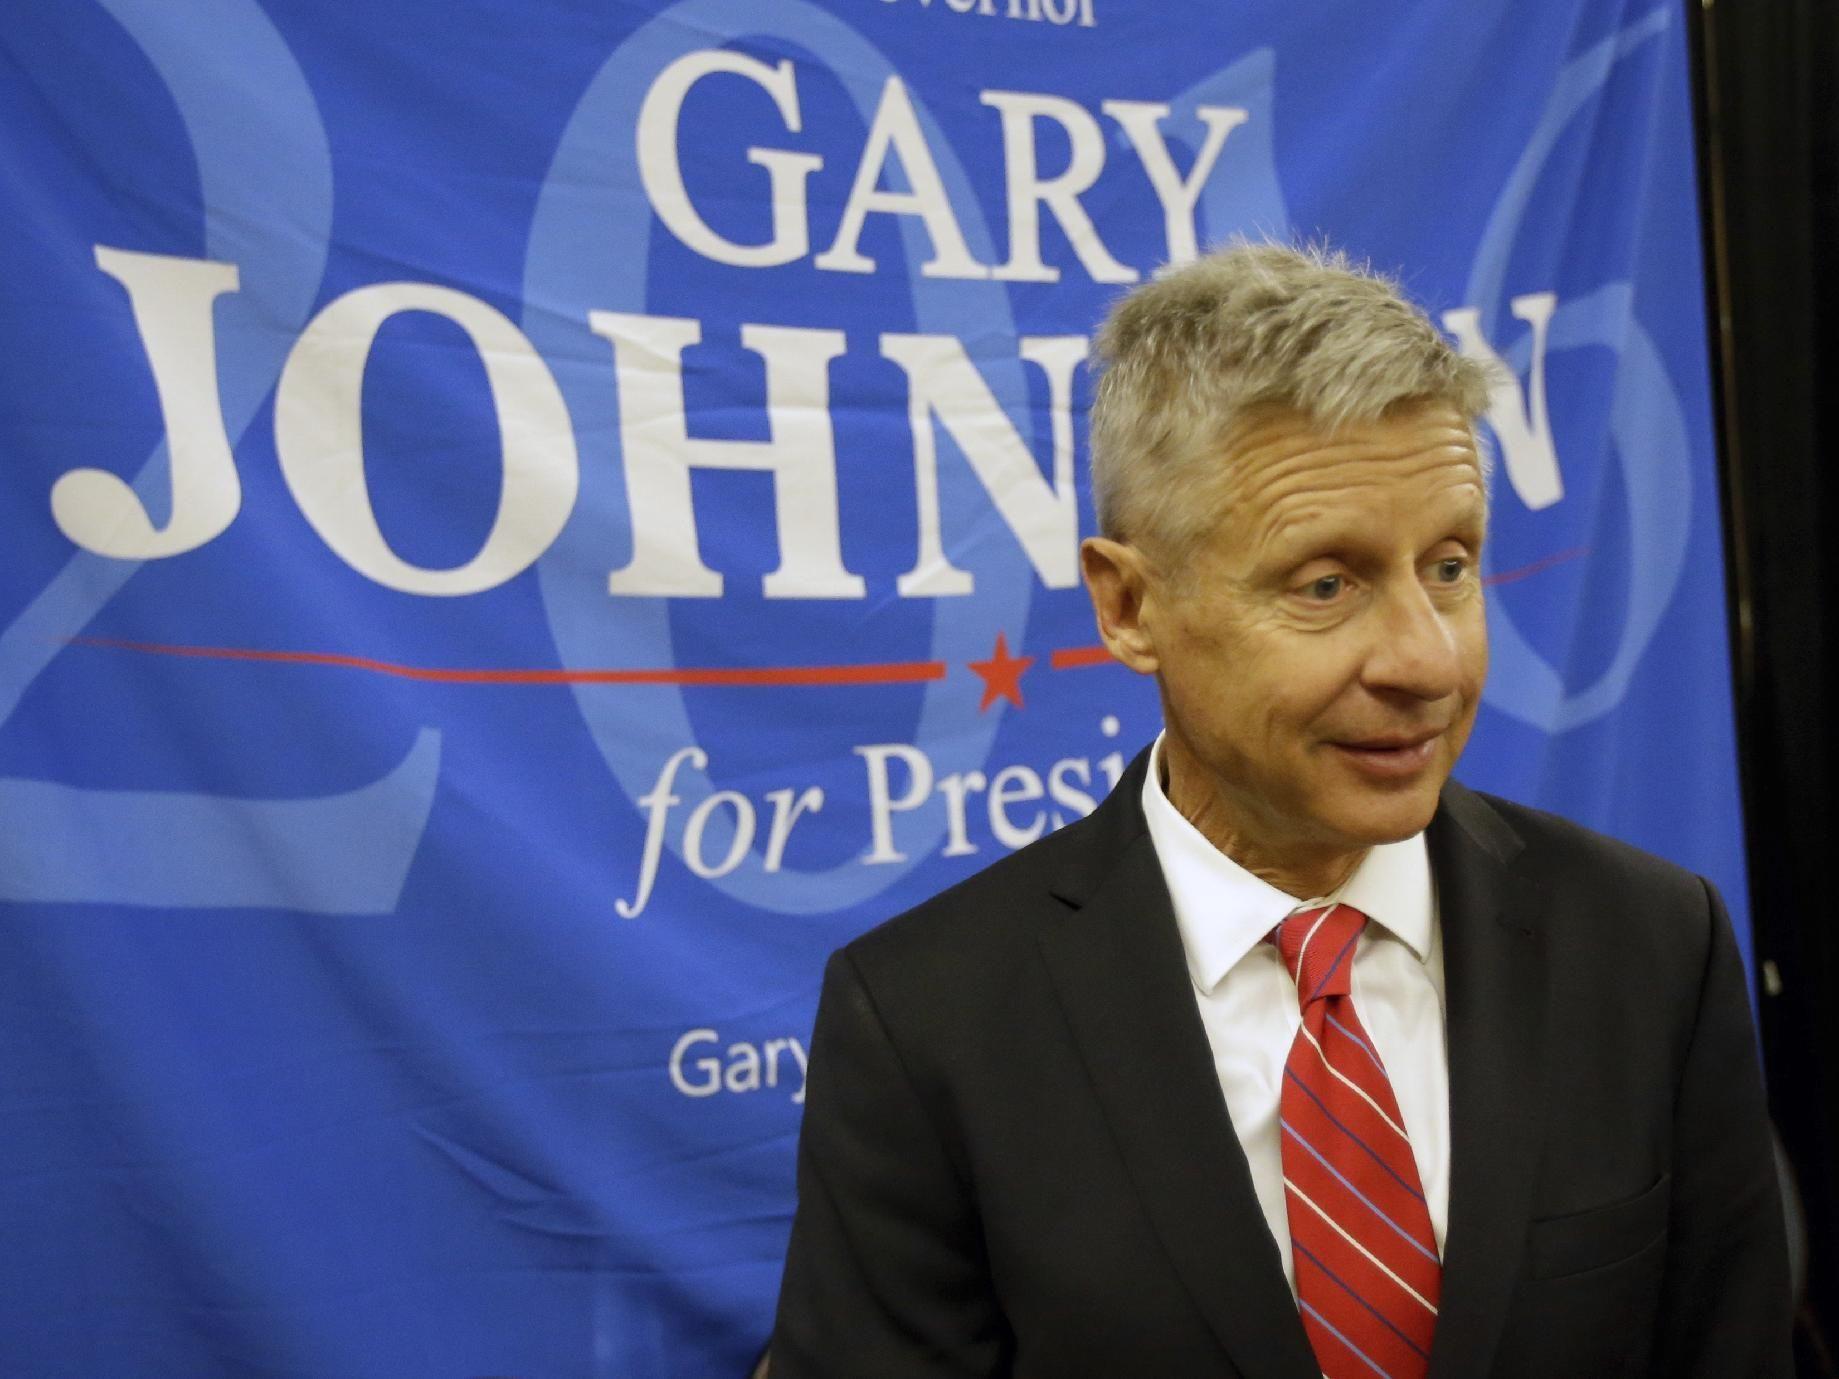 Gary-Johnson-10.15.jpg